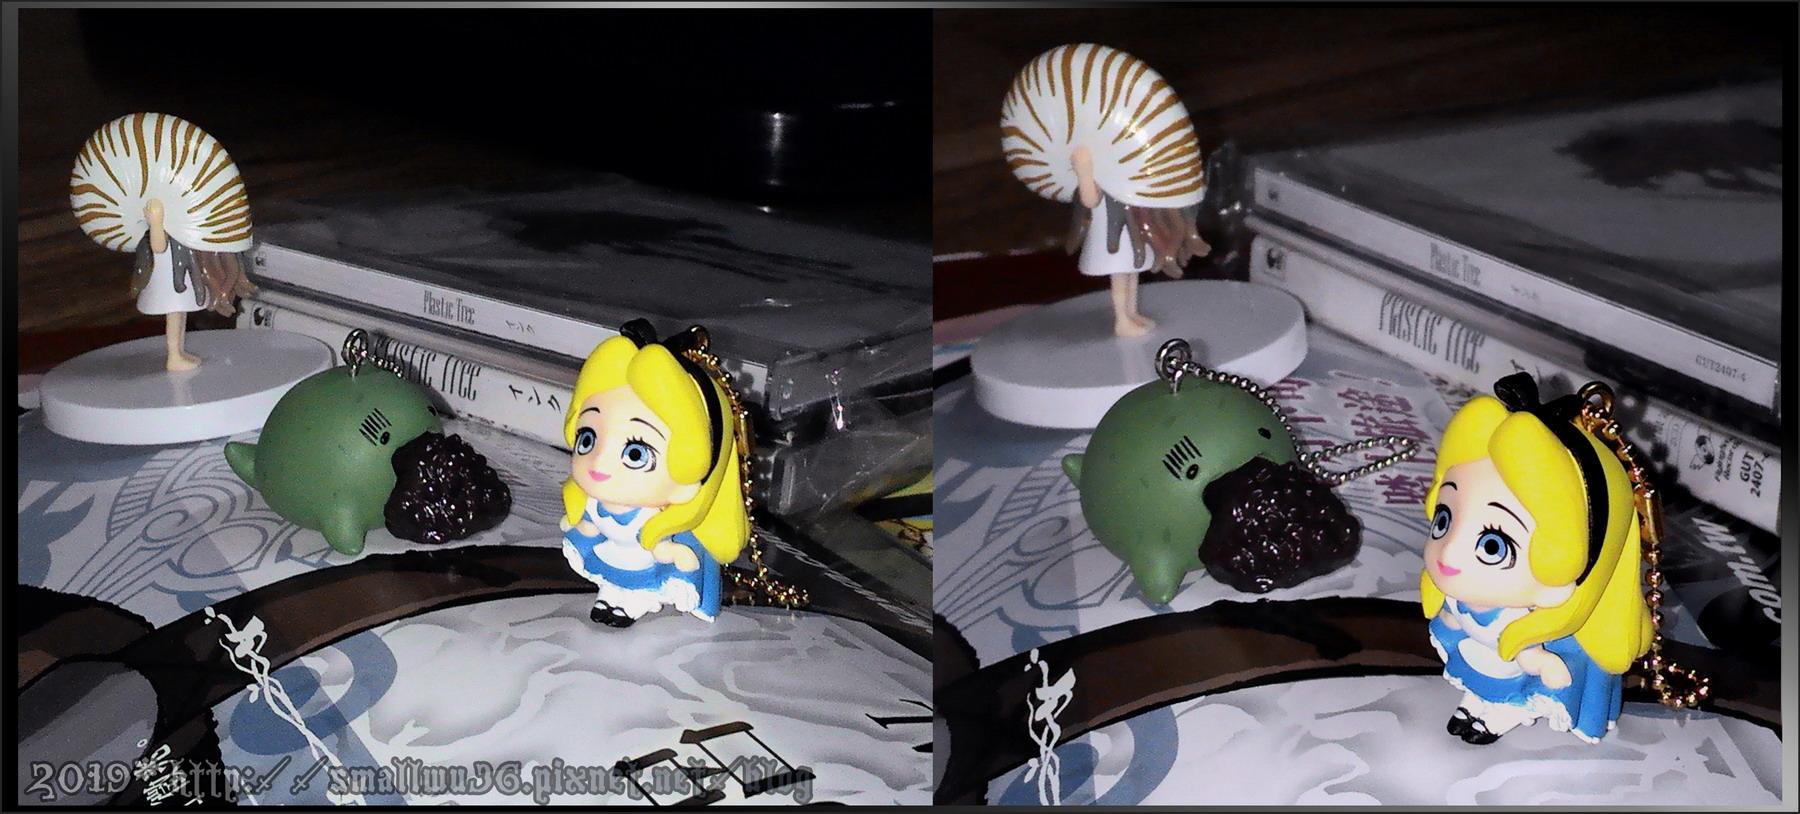 迪士尼-愛麗絲扭蛋, よもぎ嘔吐紅豆扭蛋.jpg